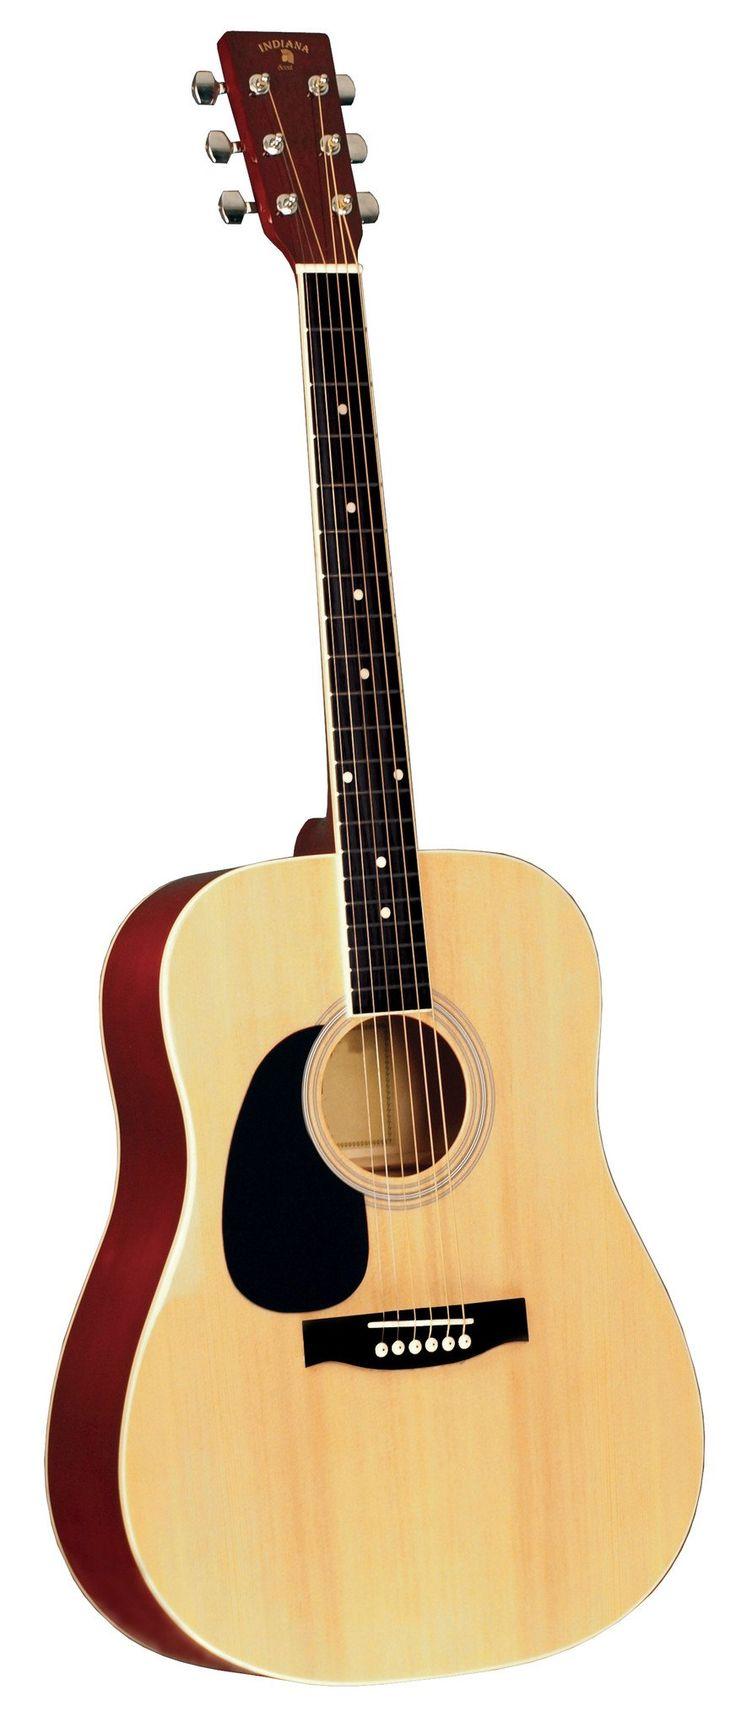 36 best Left Handed Acoustic Guitar images on Pinterest | Left ...